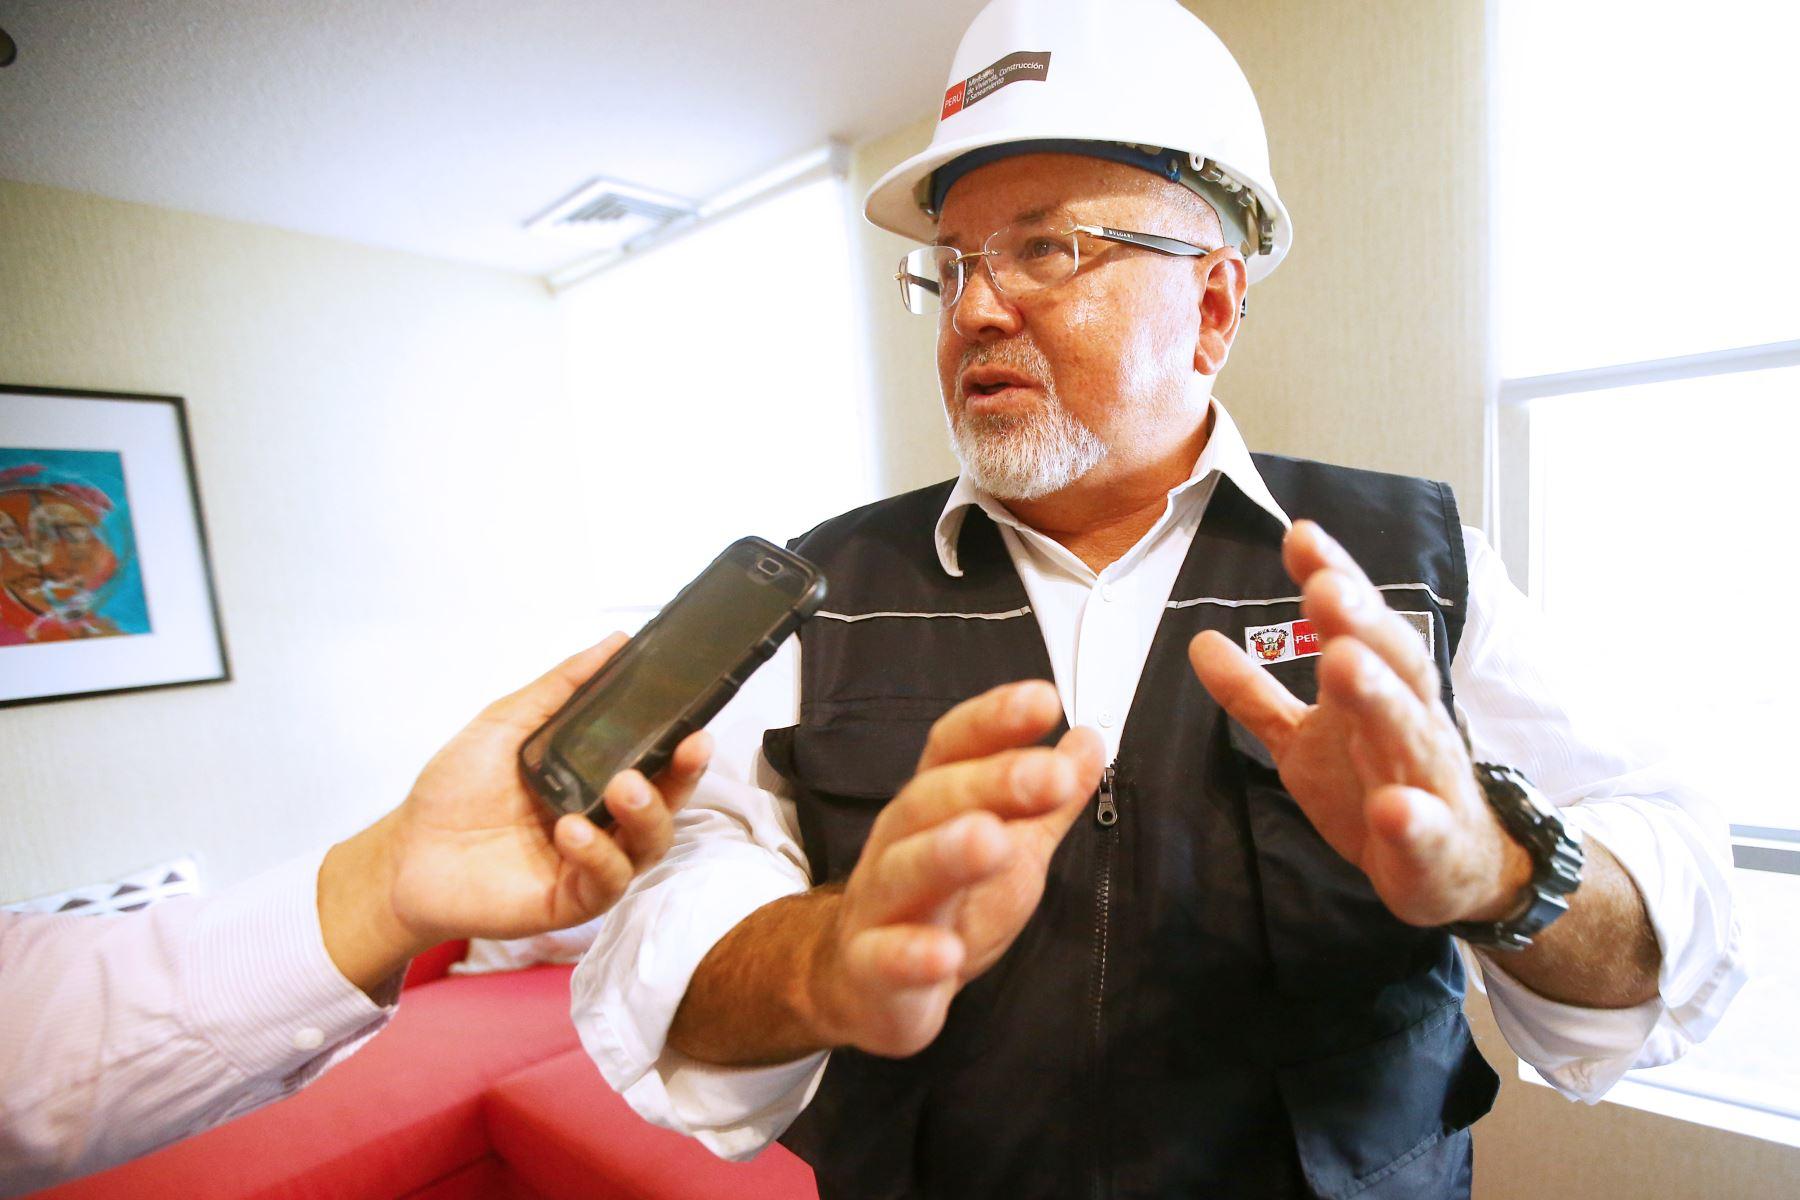 Congresista Kenji Fujimori acompaña al presidente Kuczynski en viaje a Puno